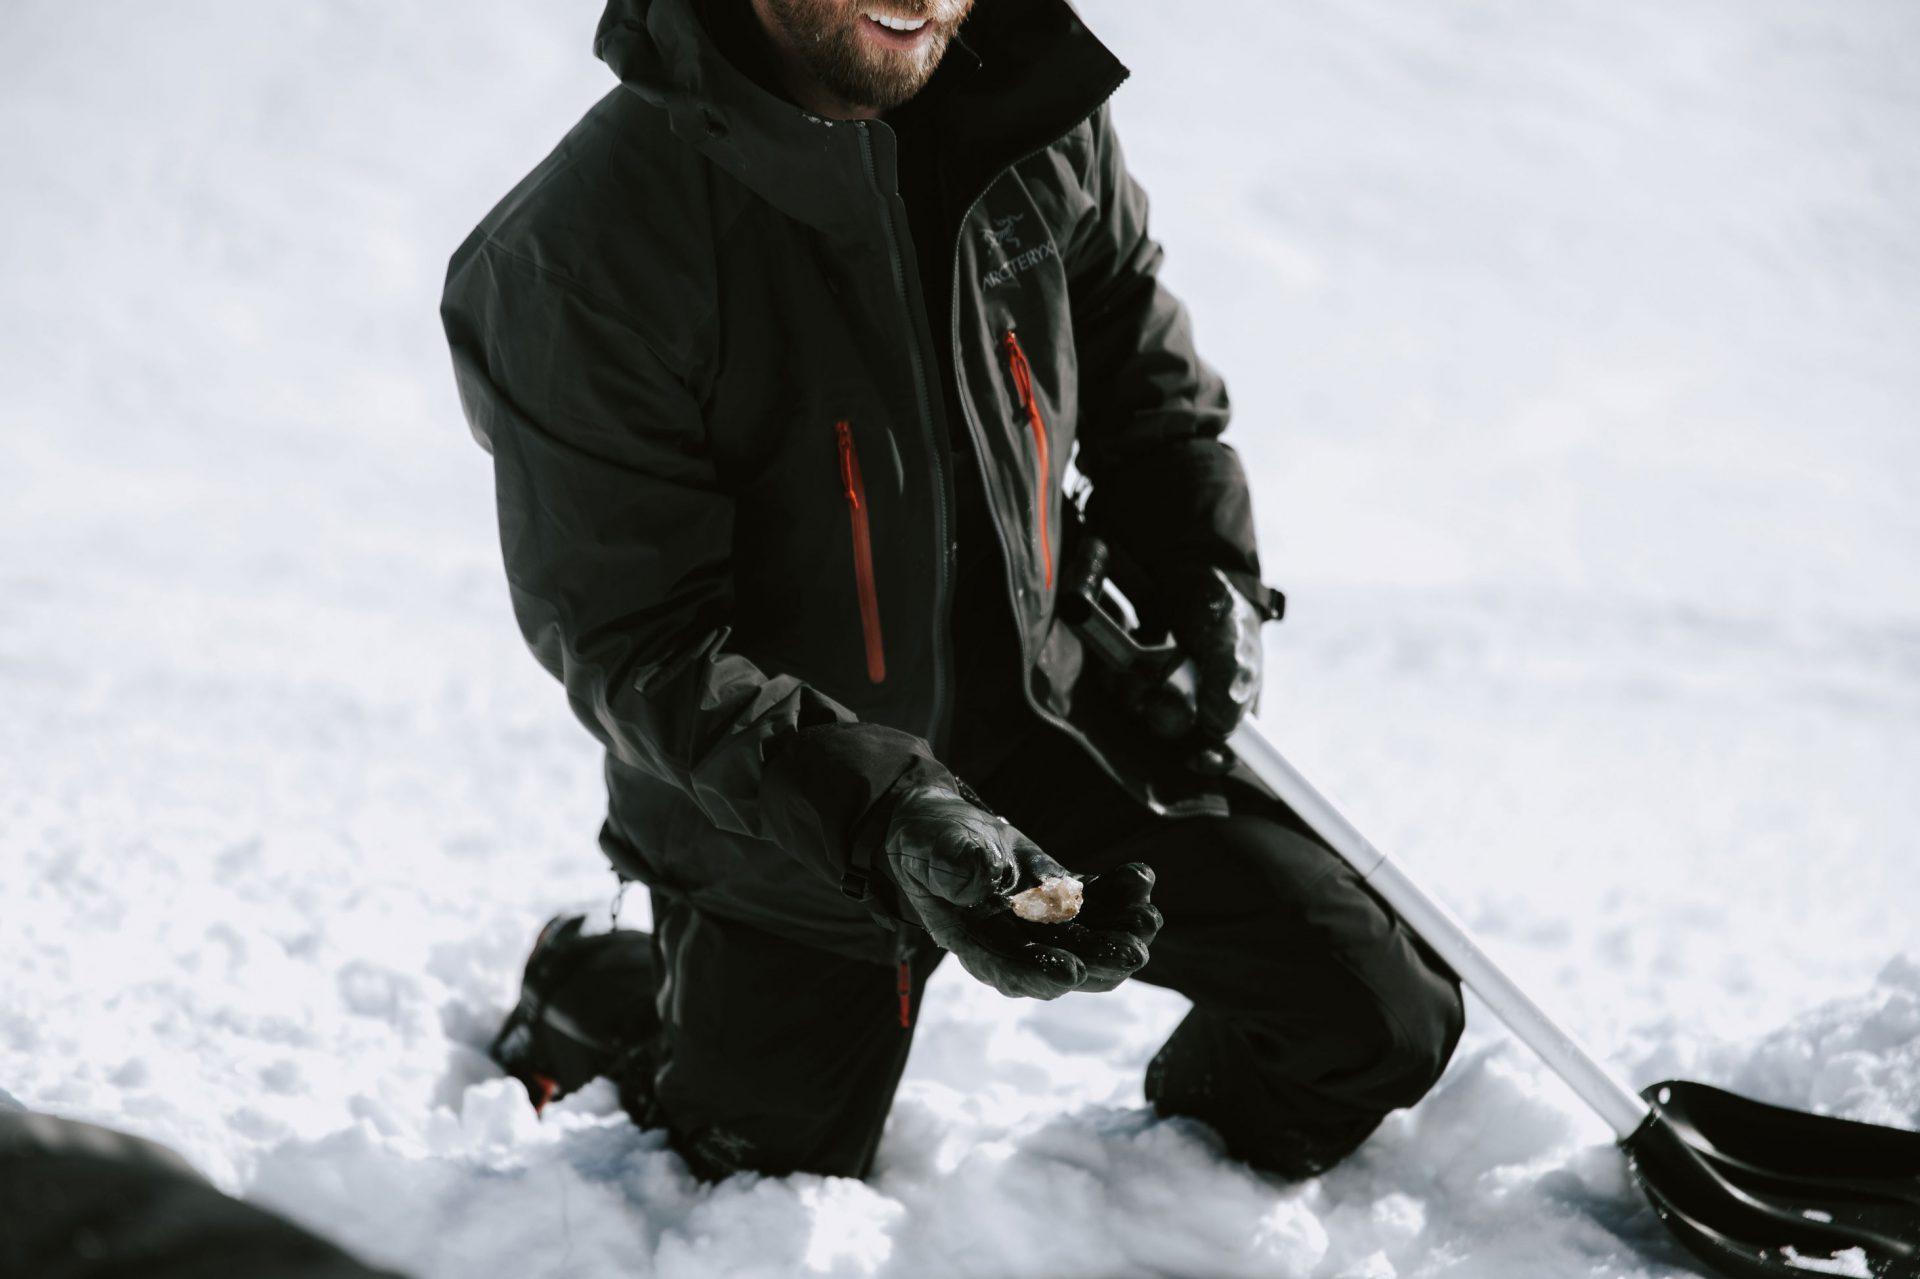 Man holding an ice crystal